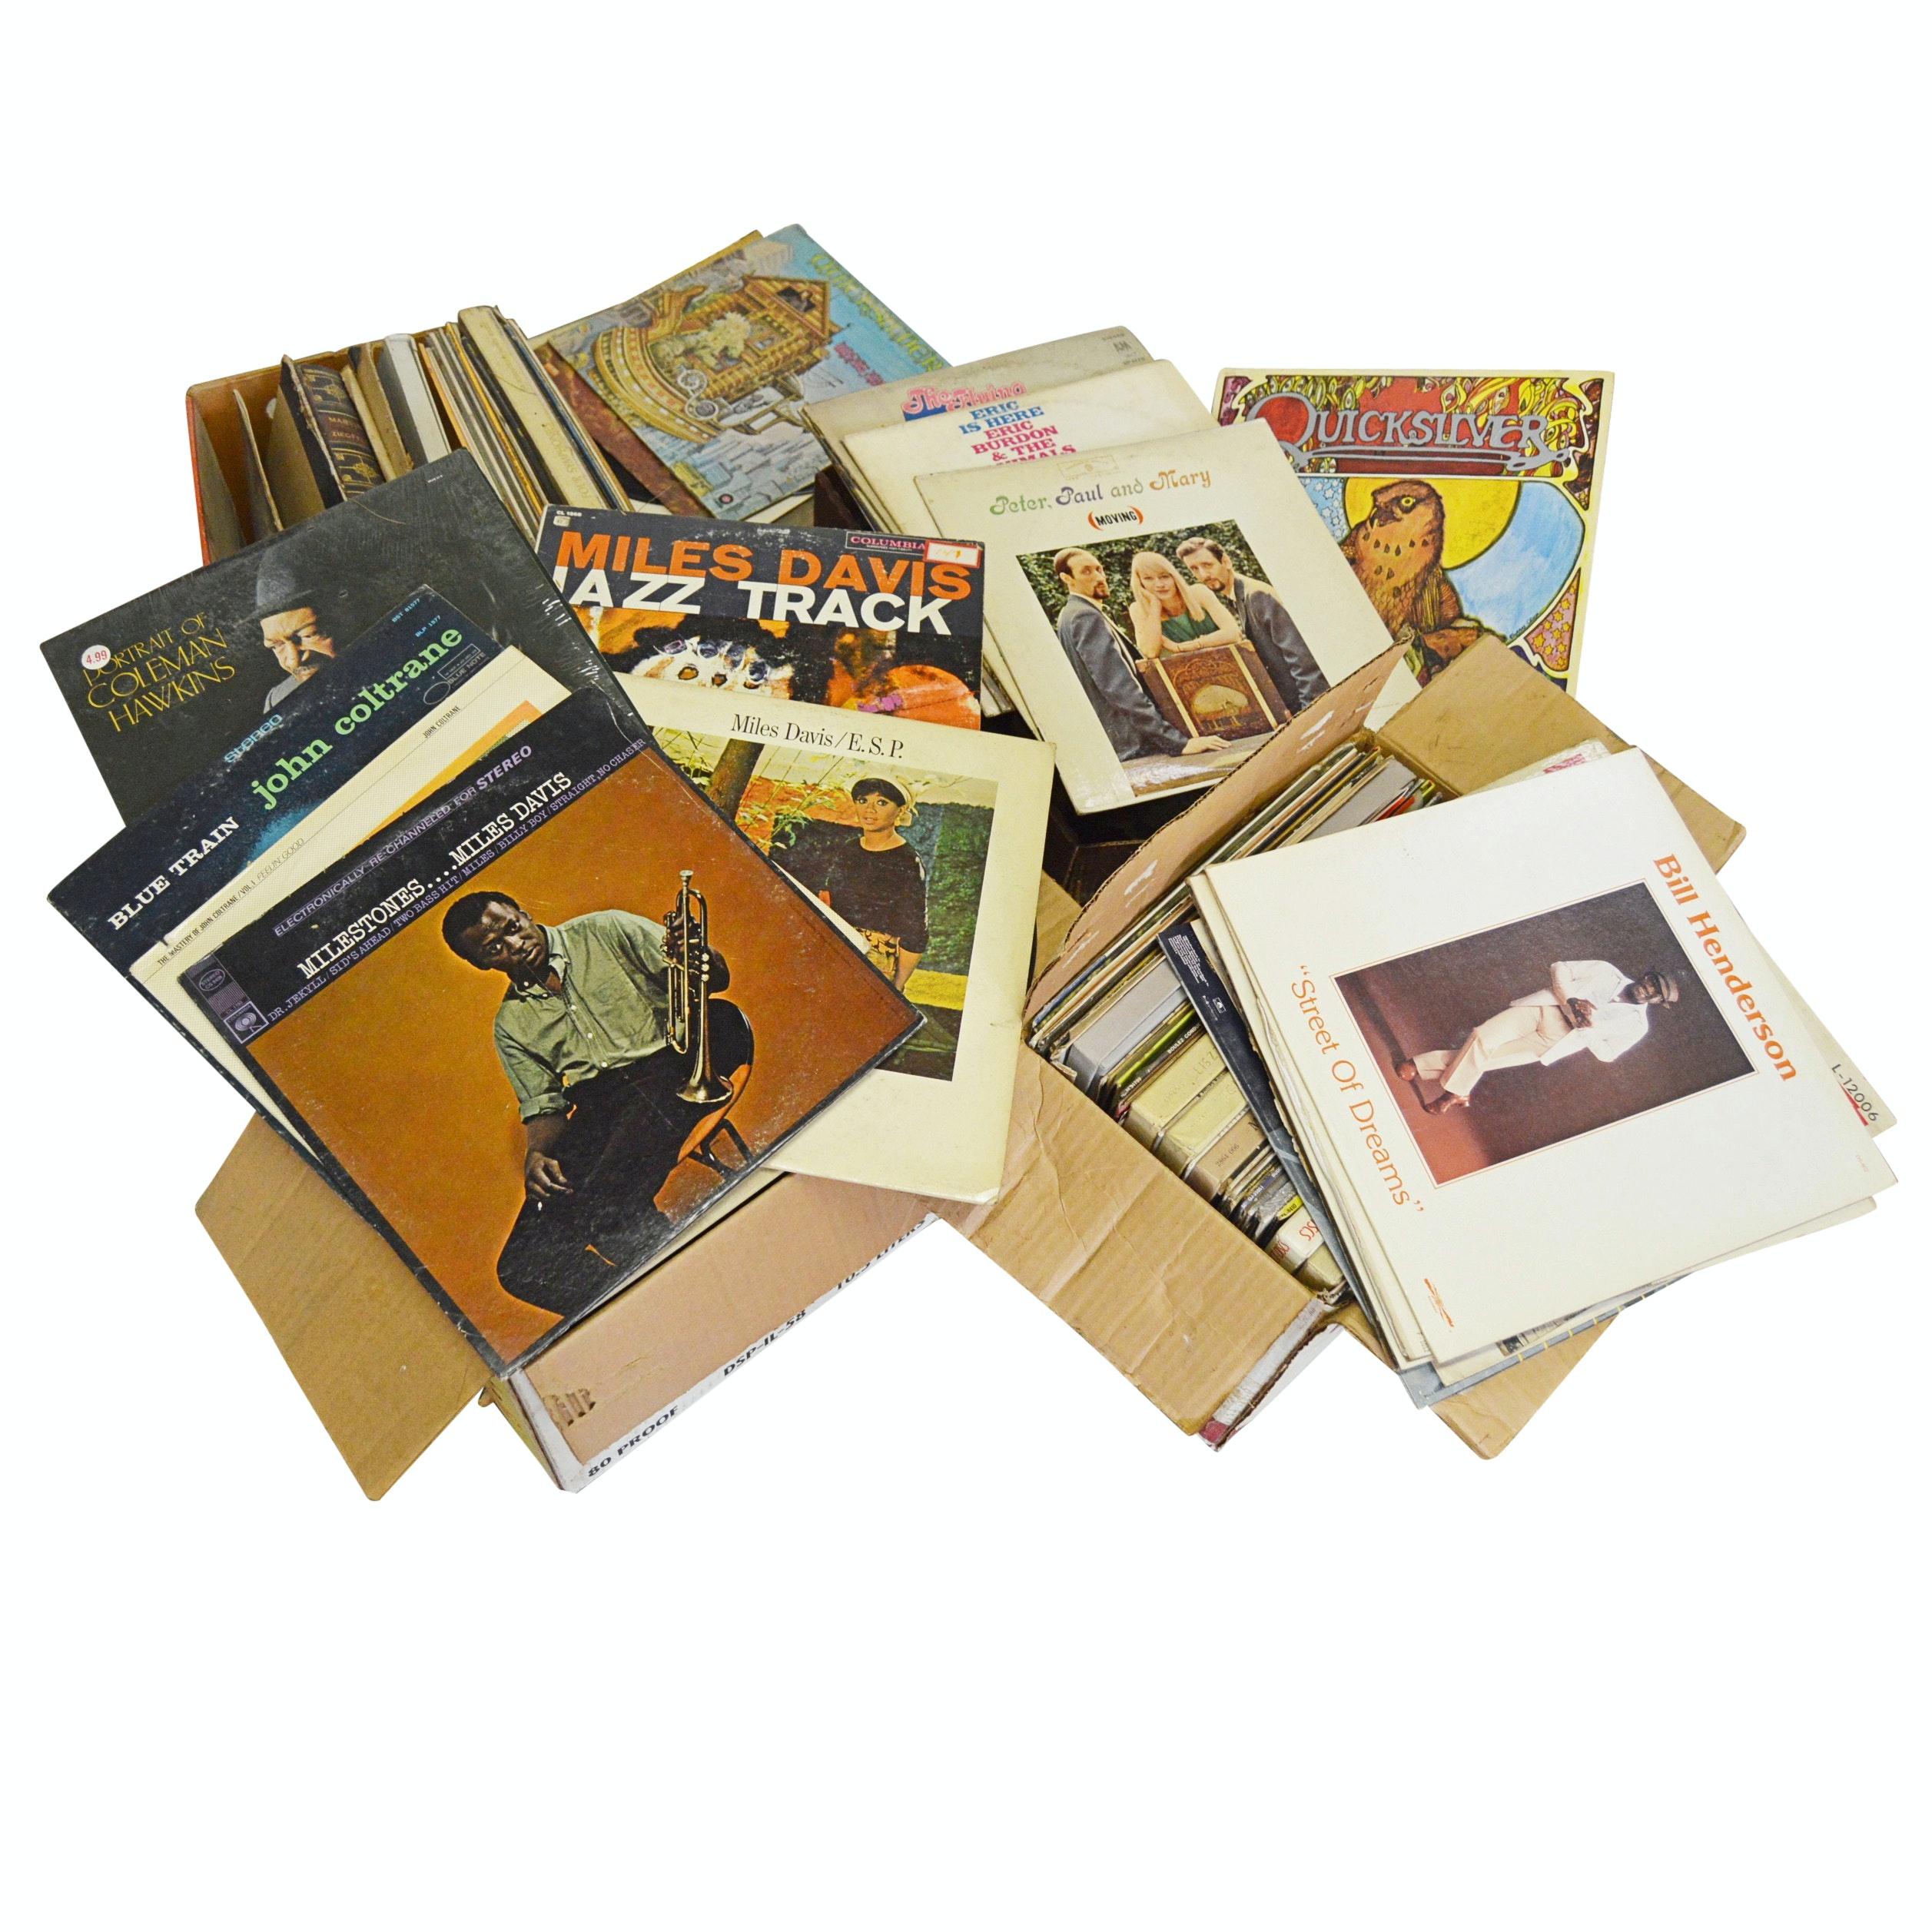 Vinyl Record Album Collection with Miles Davis, John Coltrane, Graham Parsons